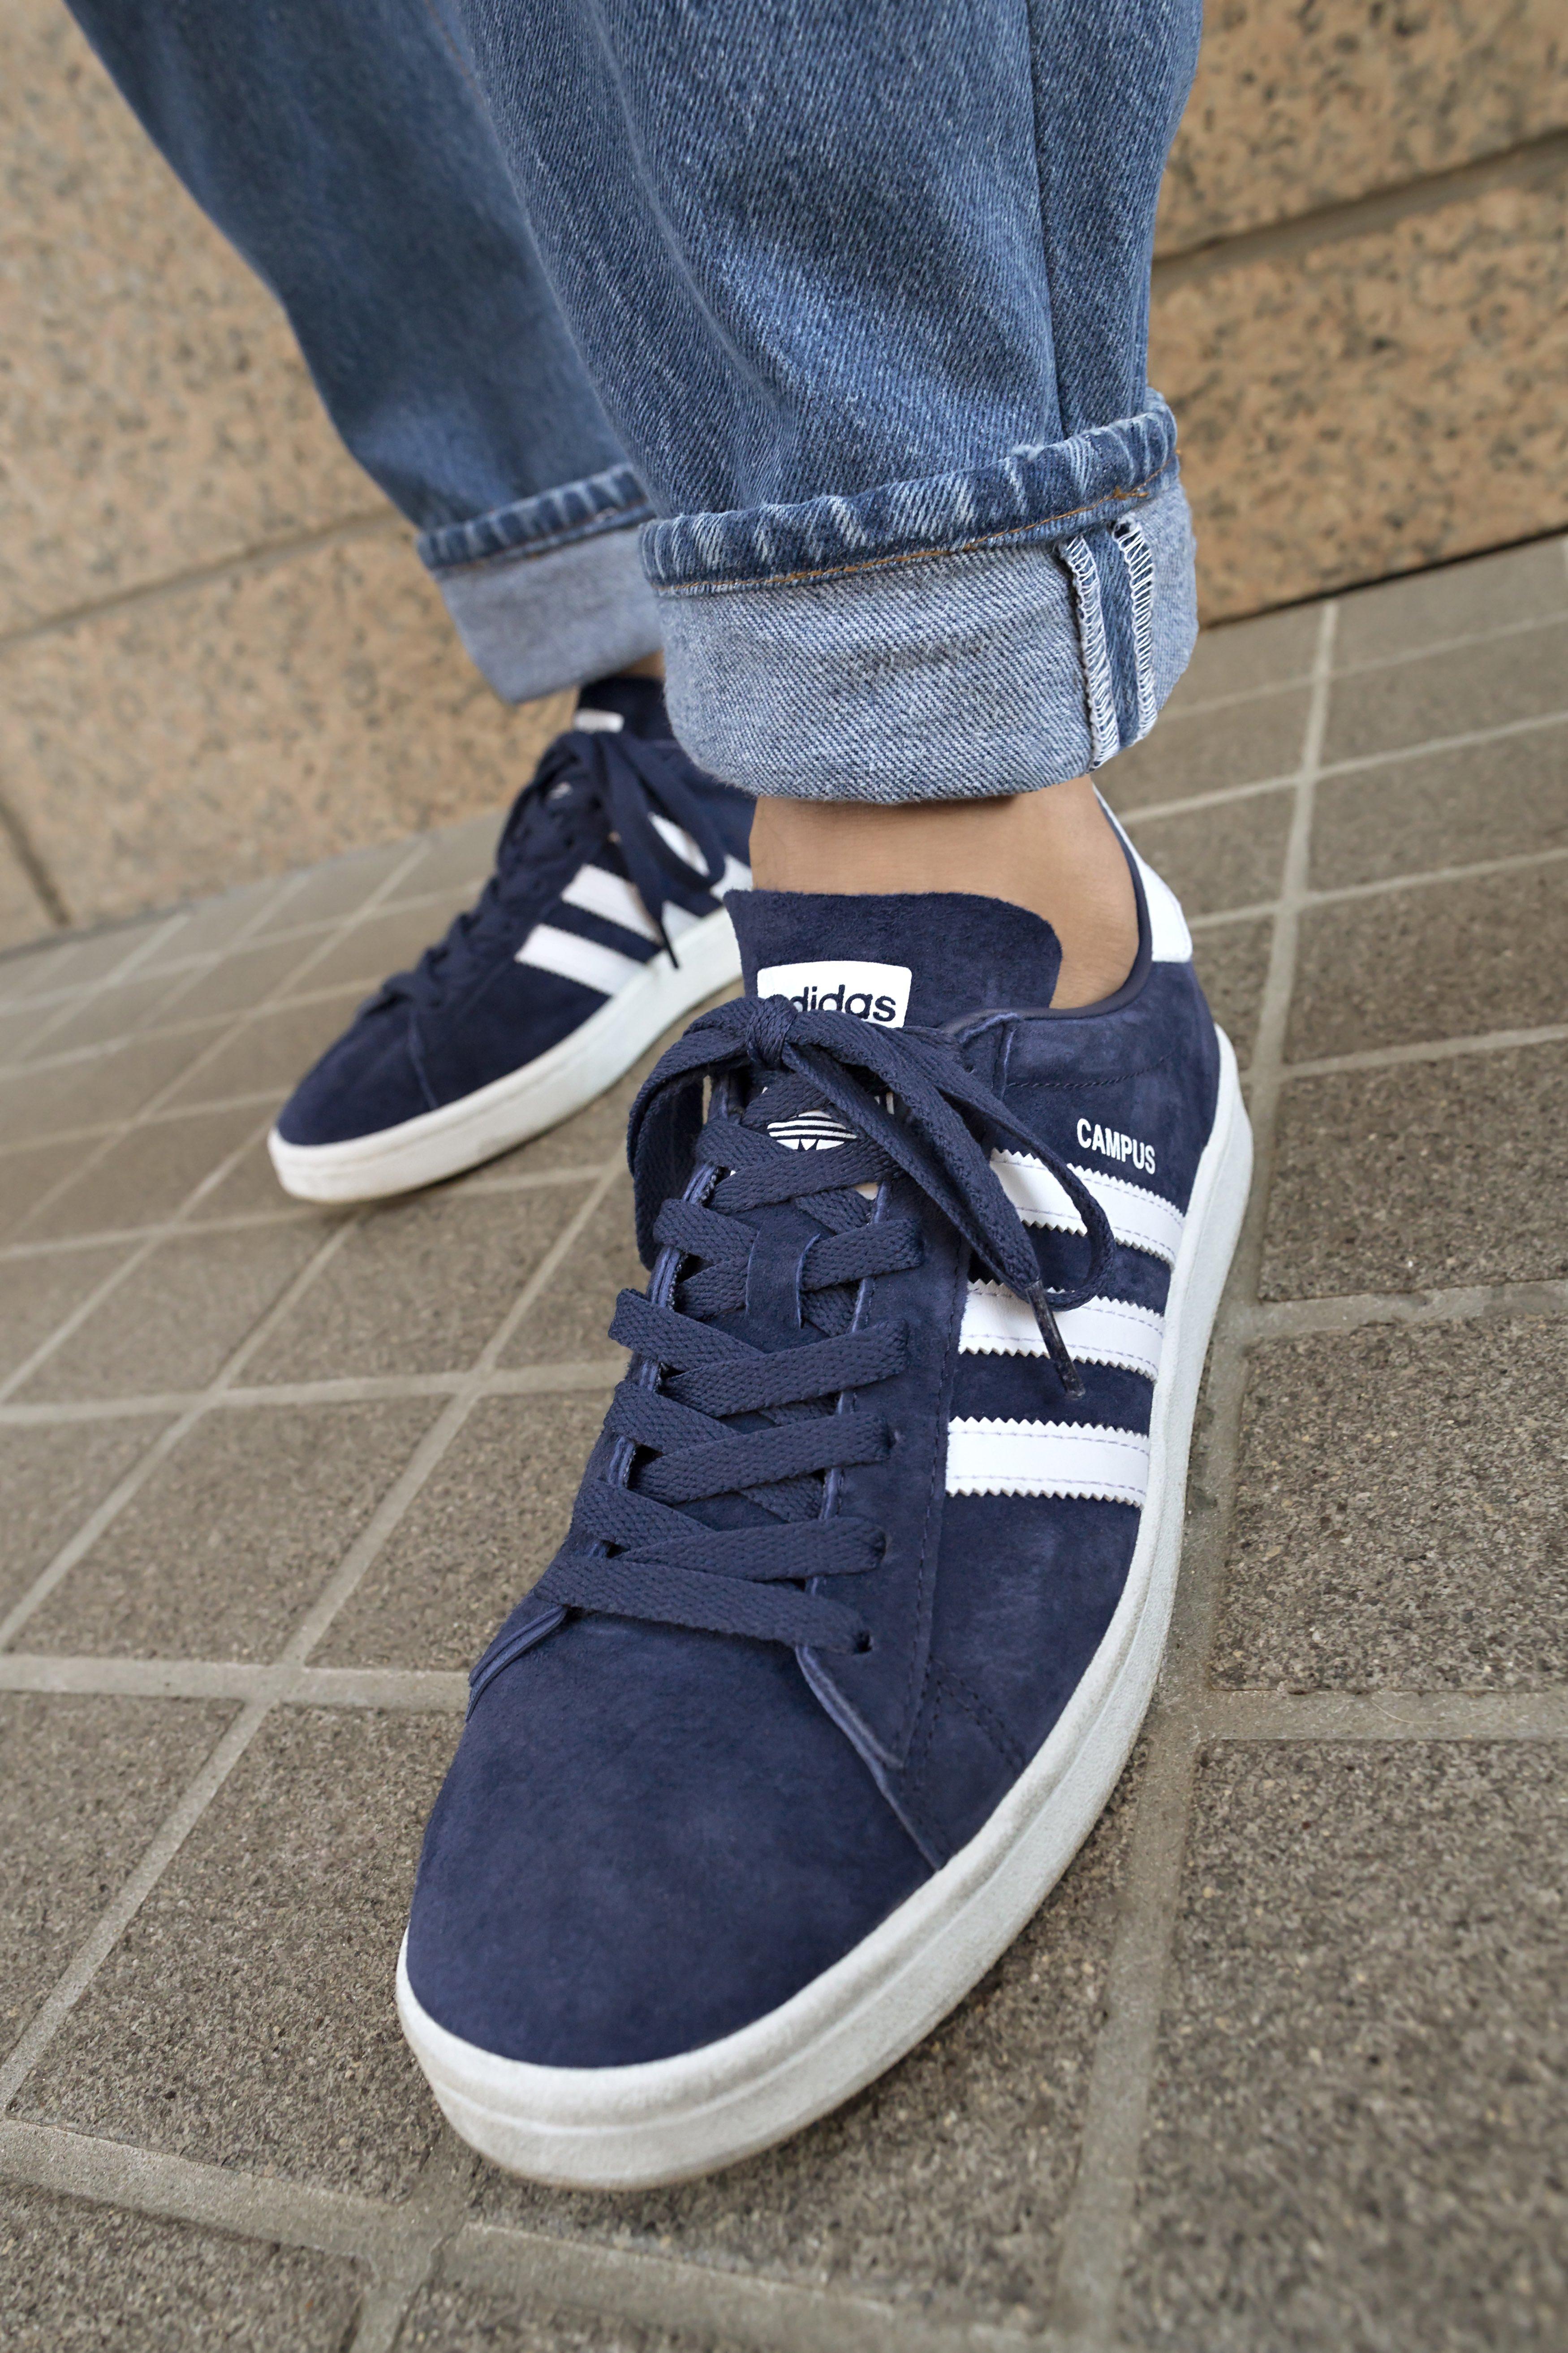 Adidas Campus Blue